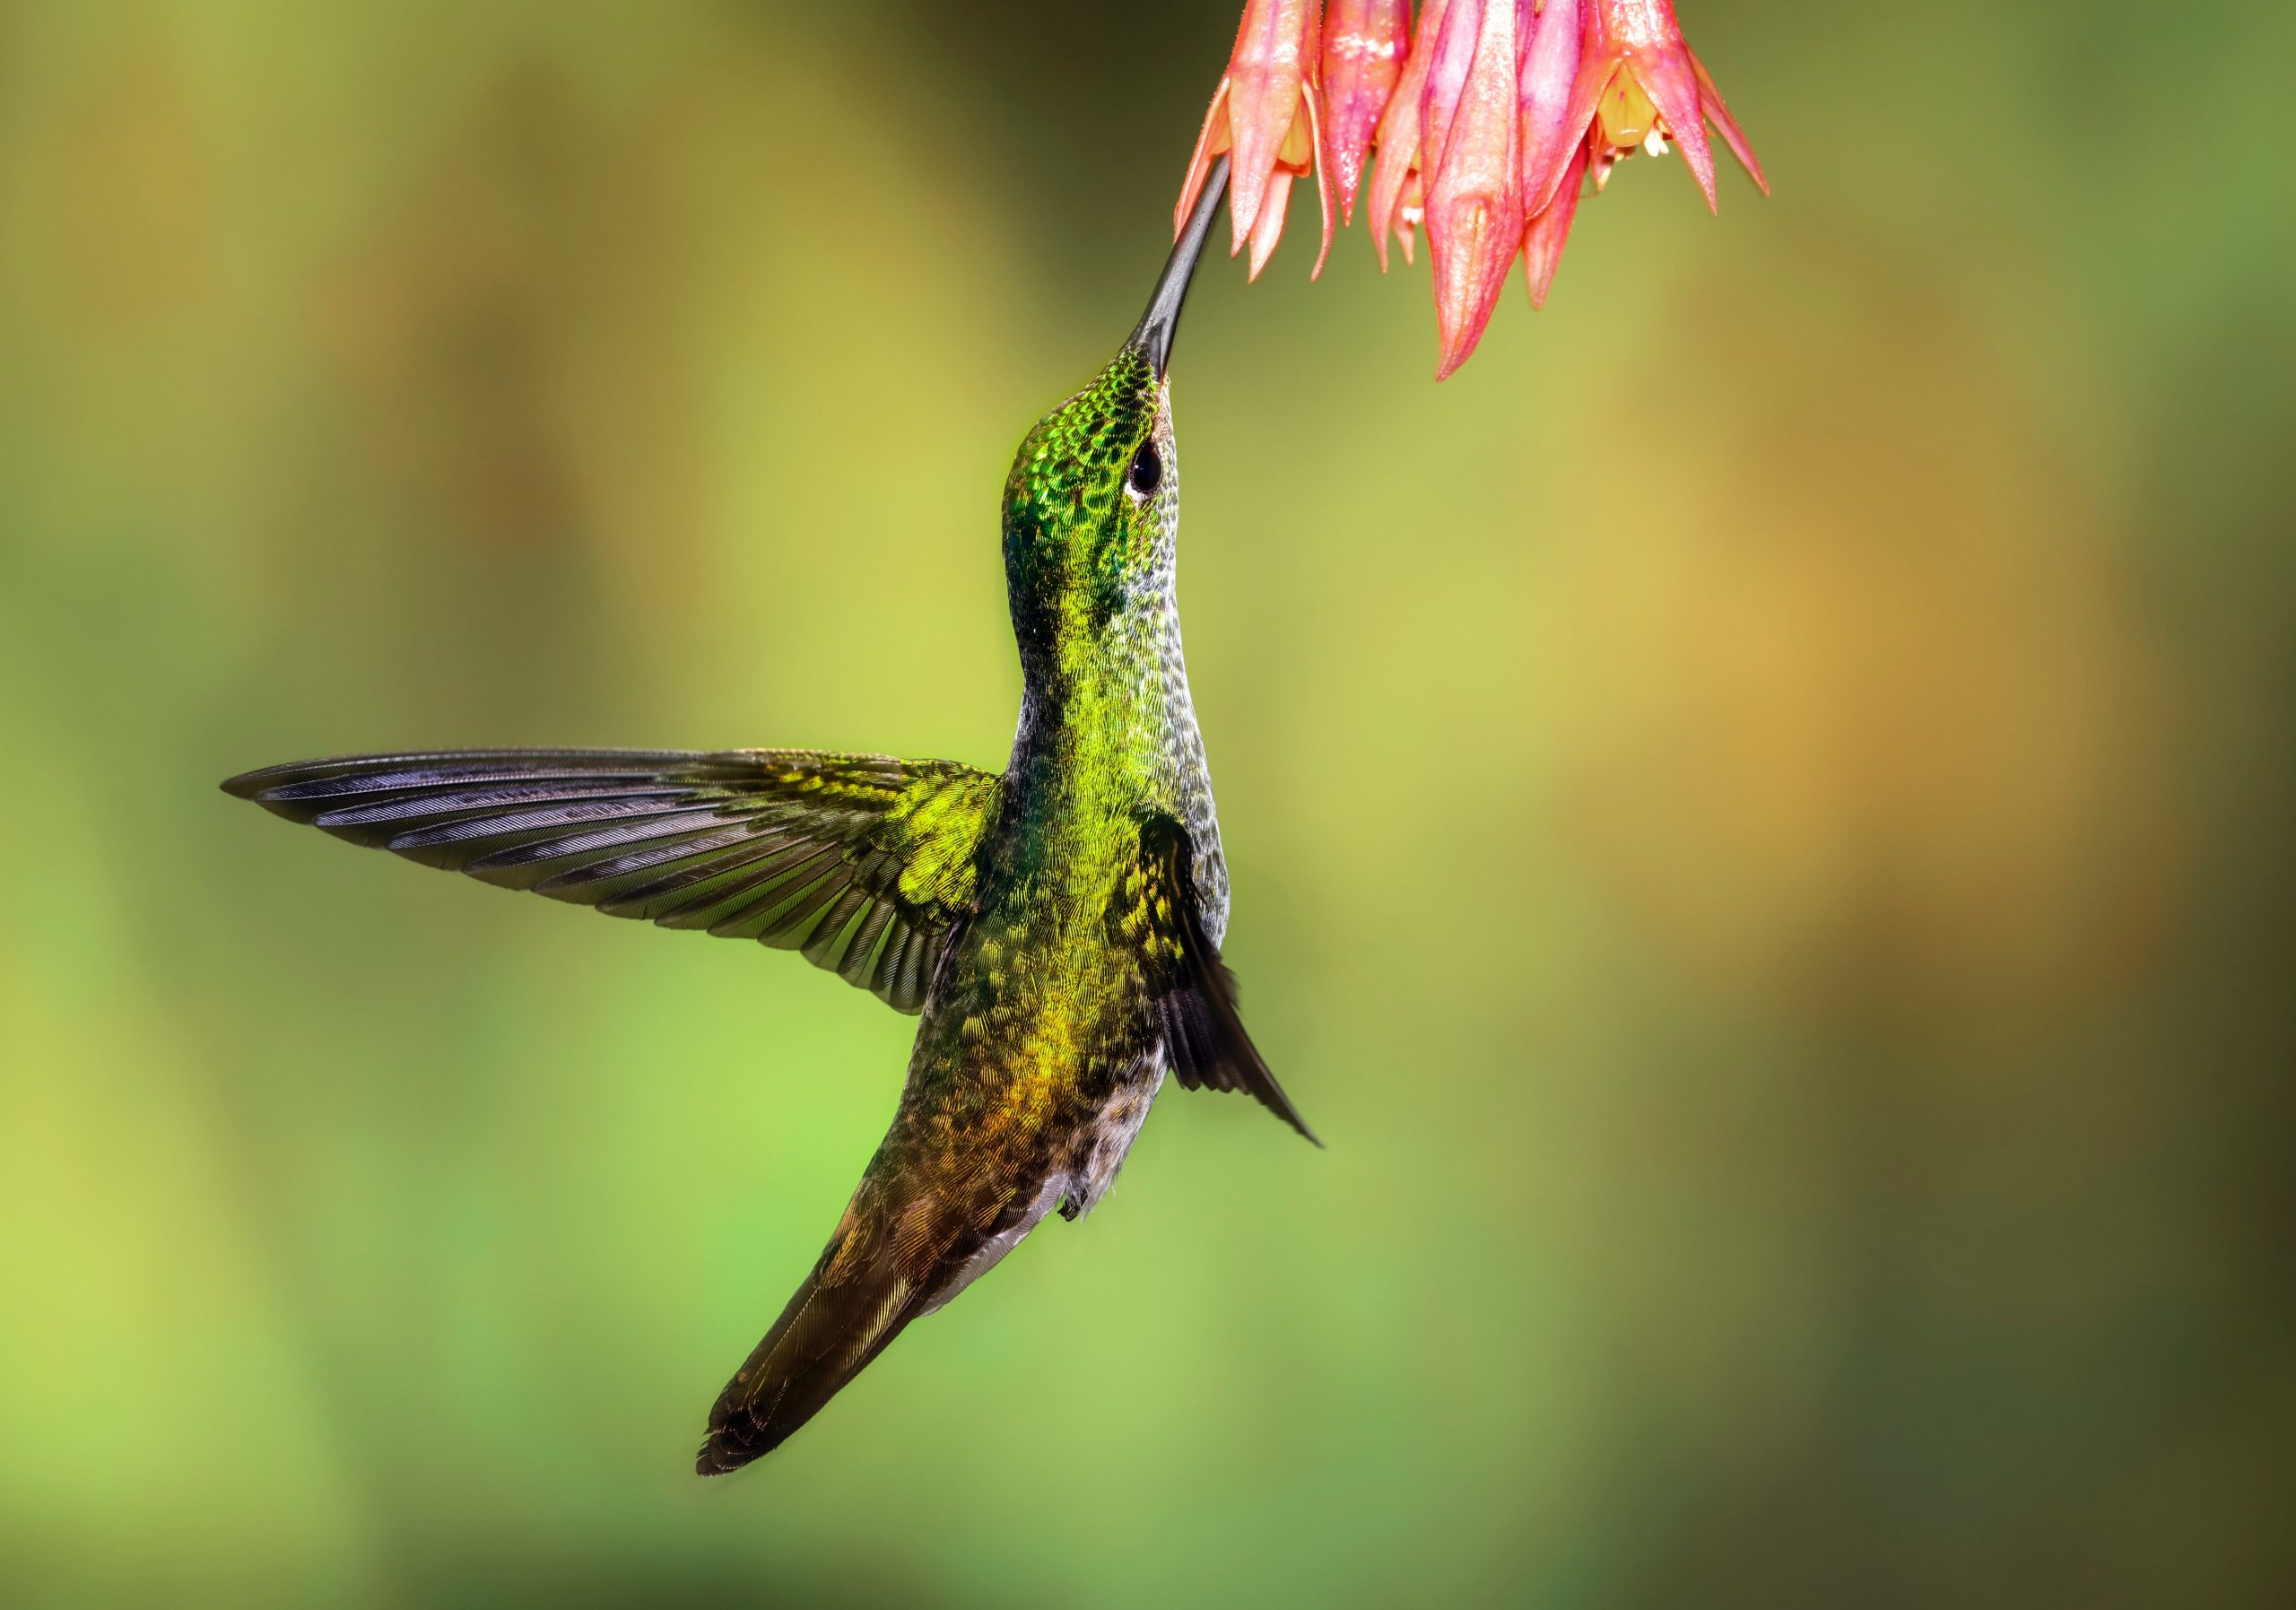 wallpaper Green hummingbird pollinating on pink petaled flowers